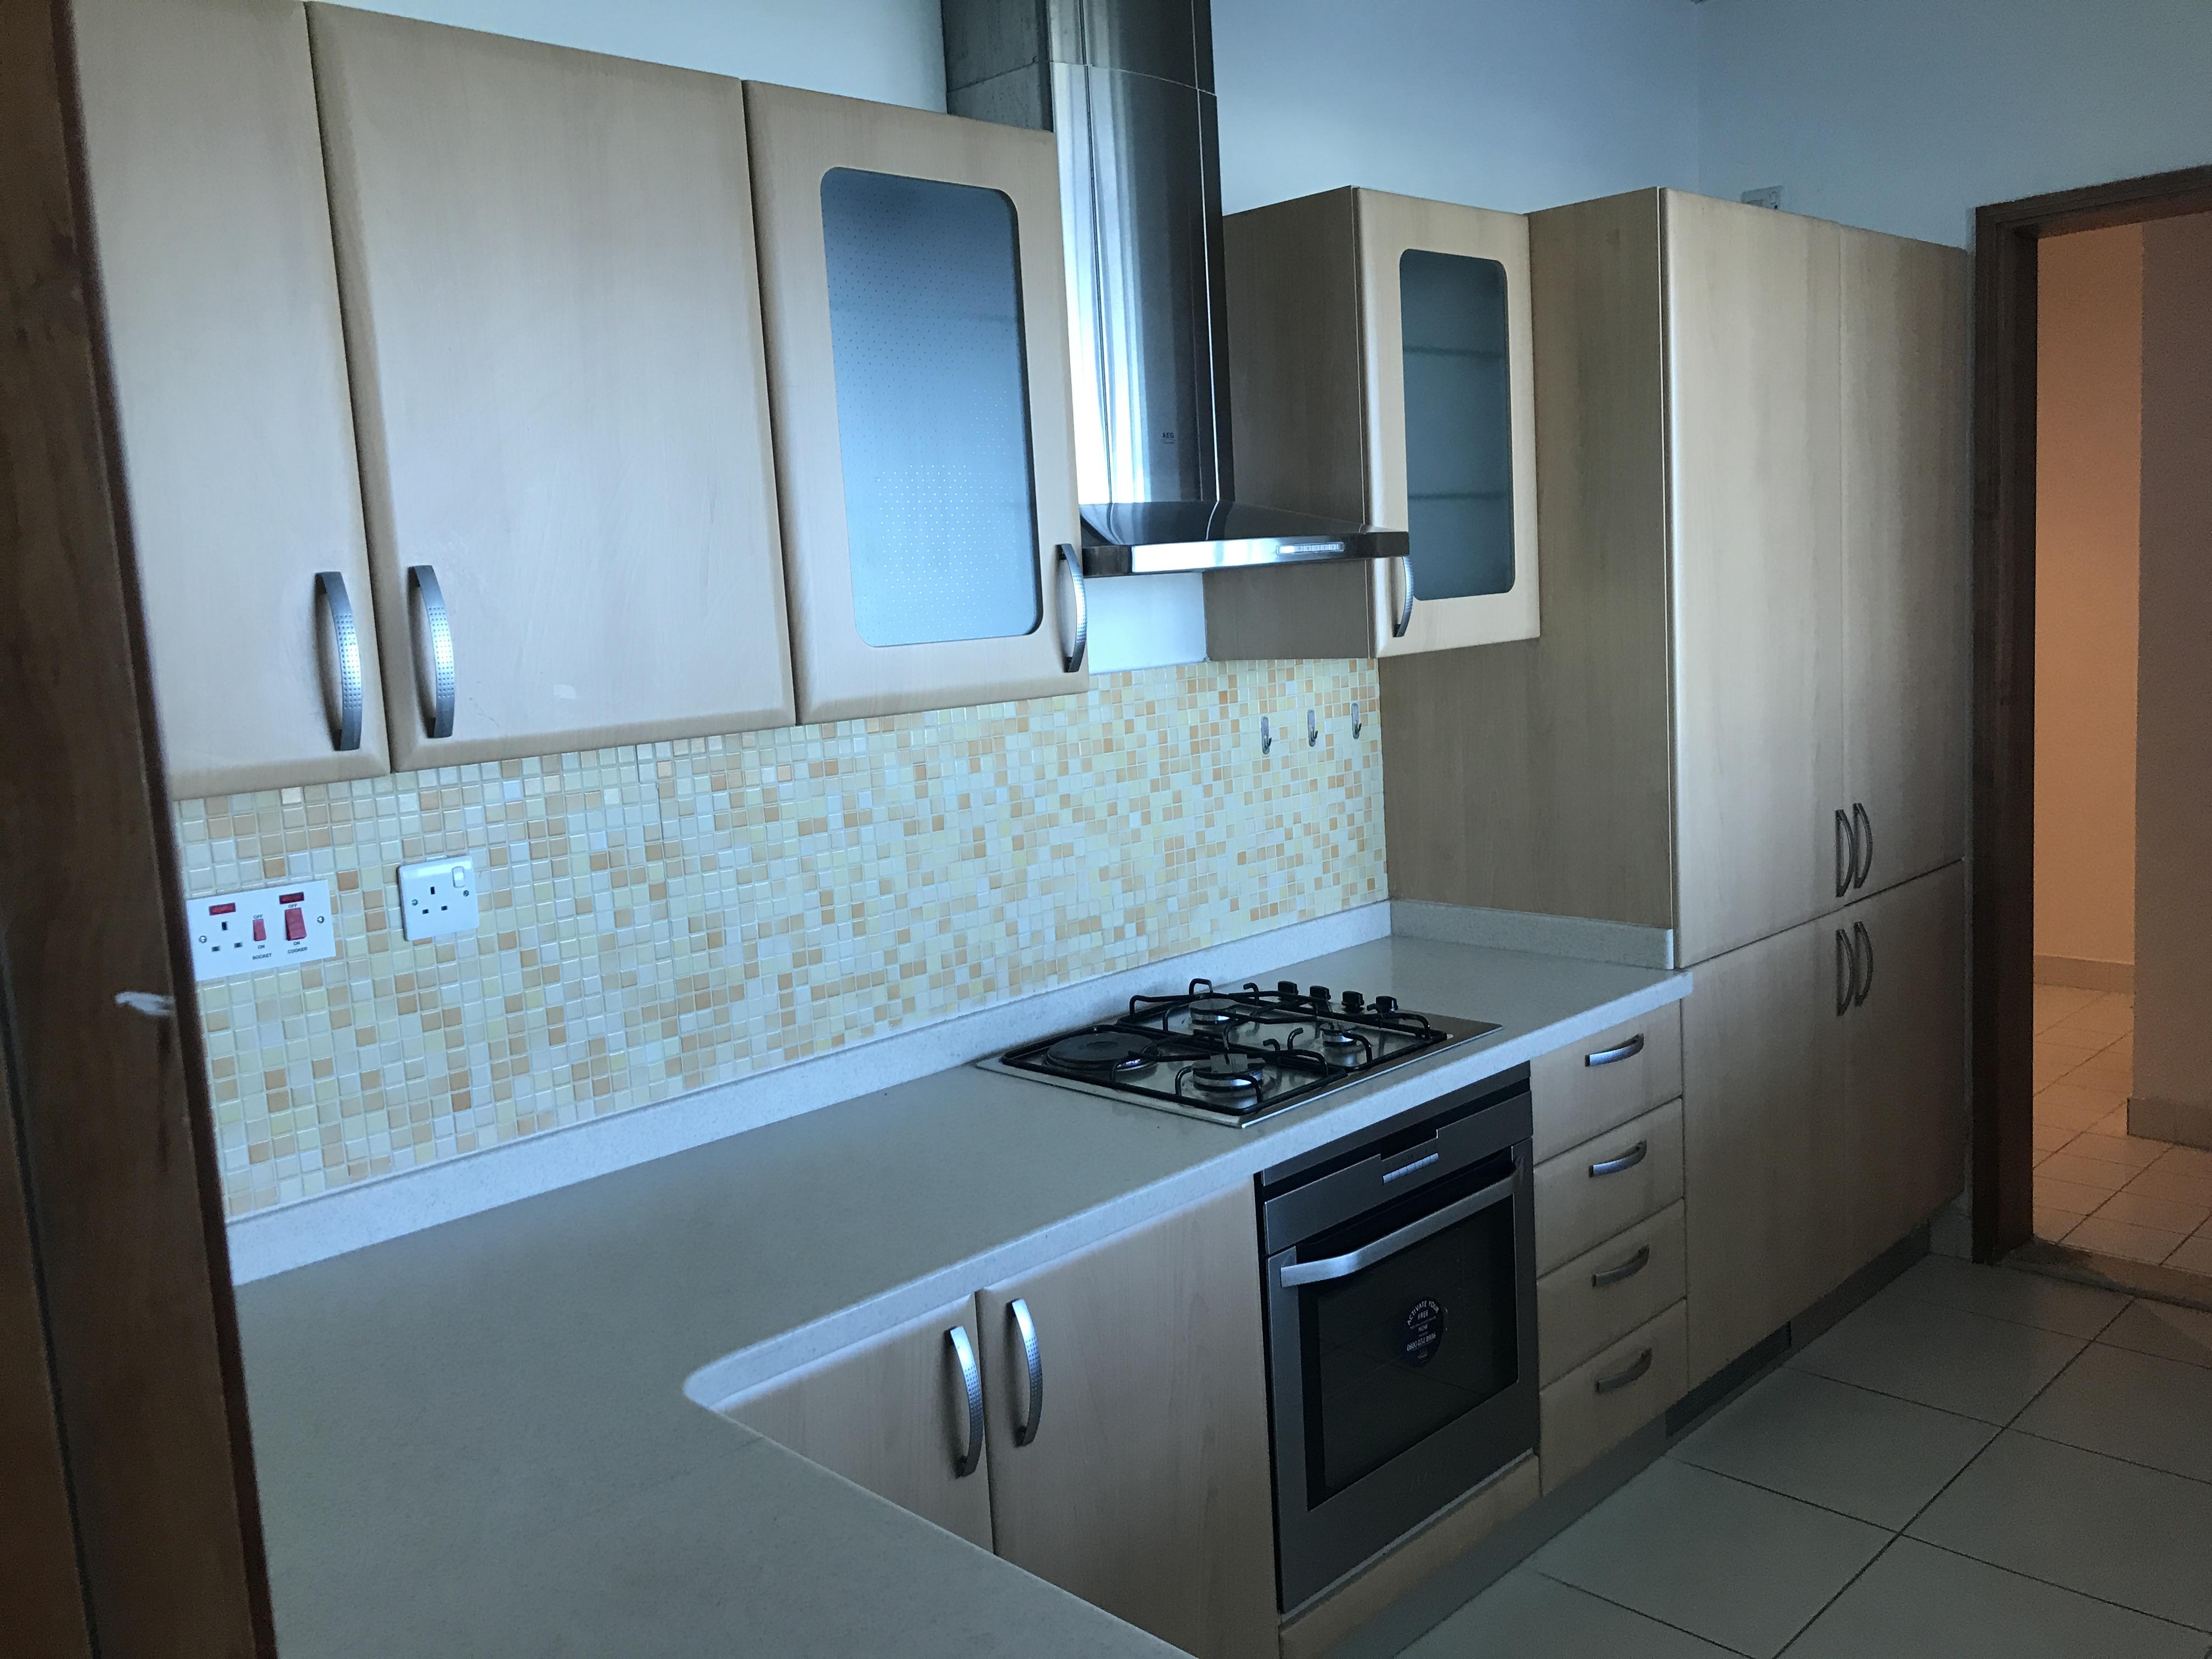 Lulwa Kitchen 2